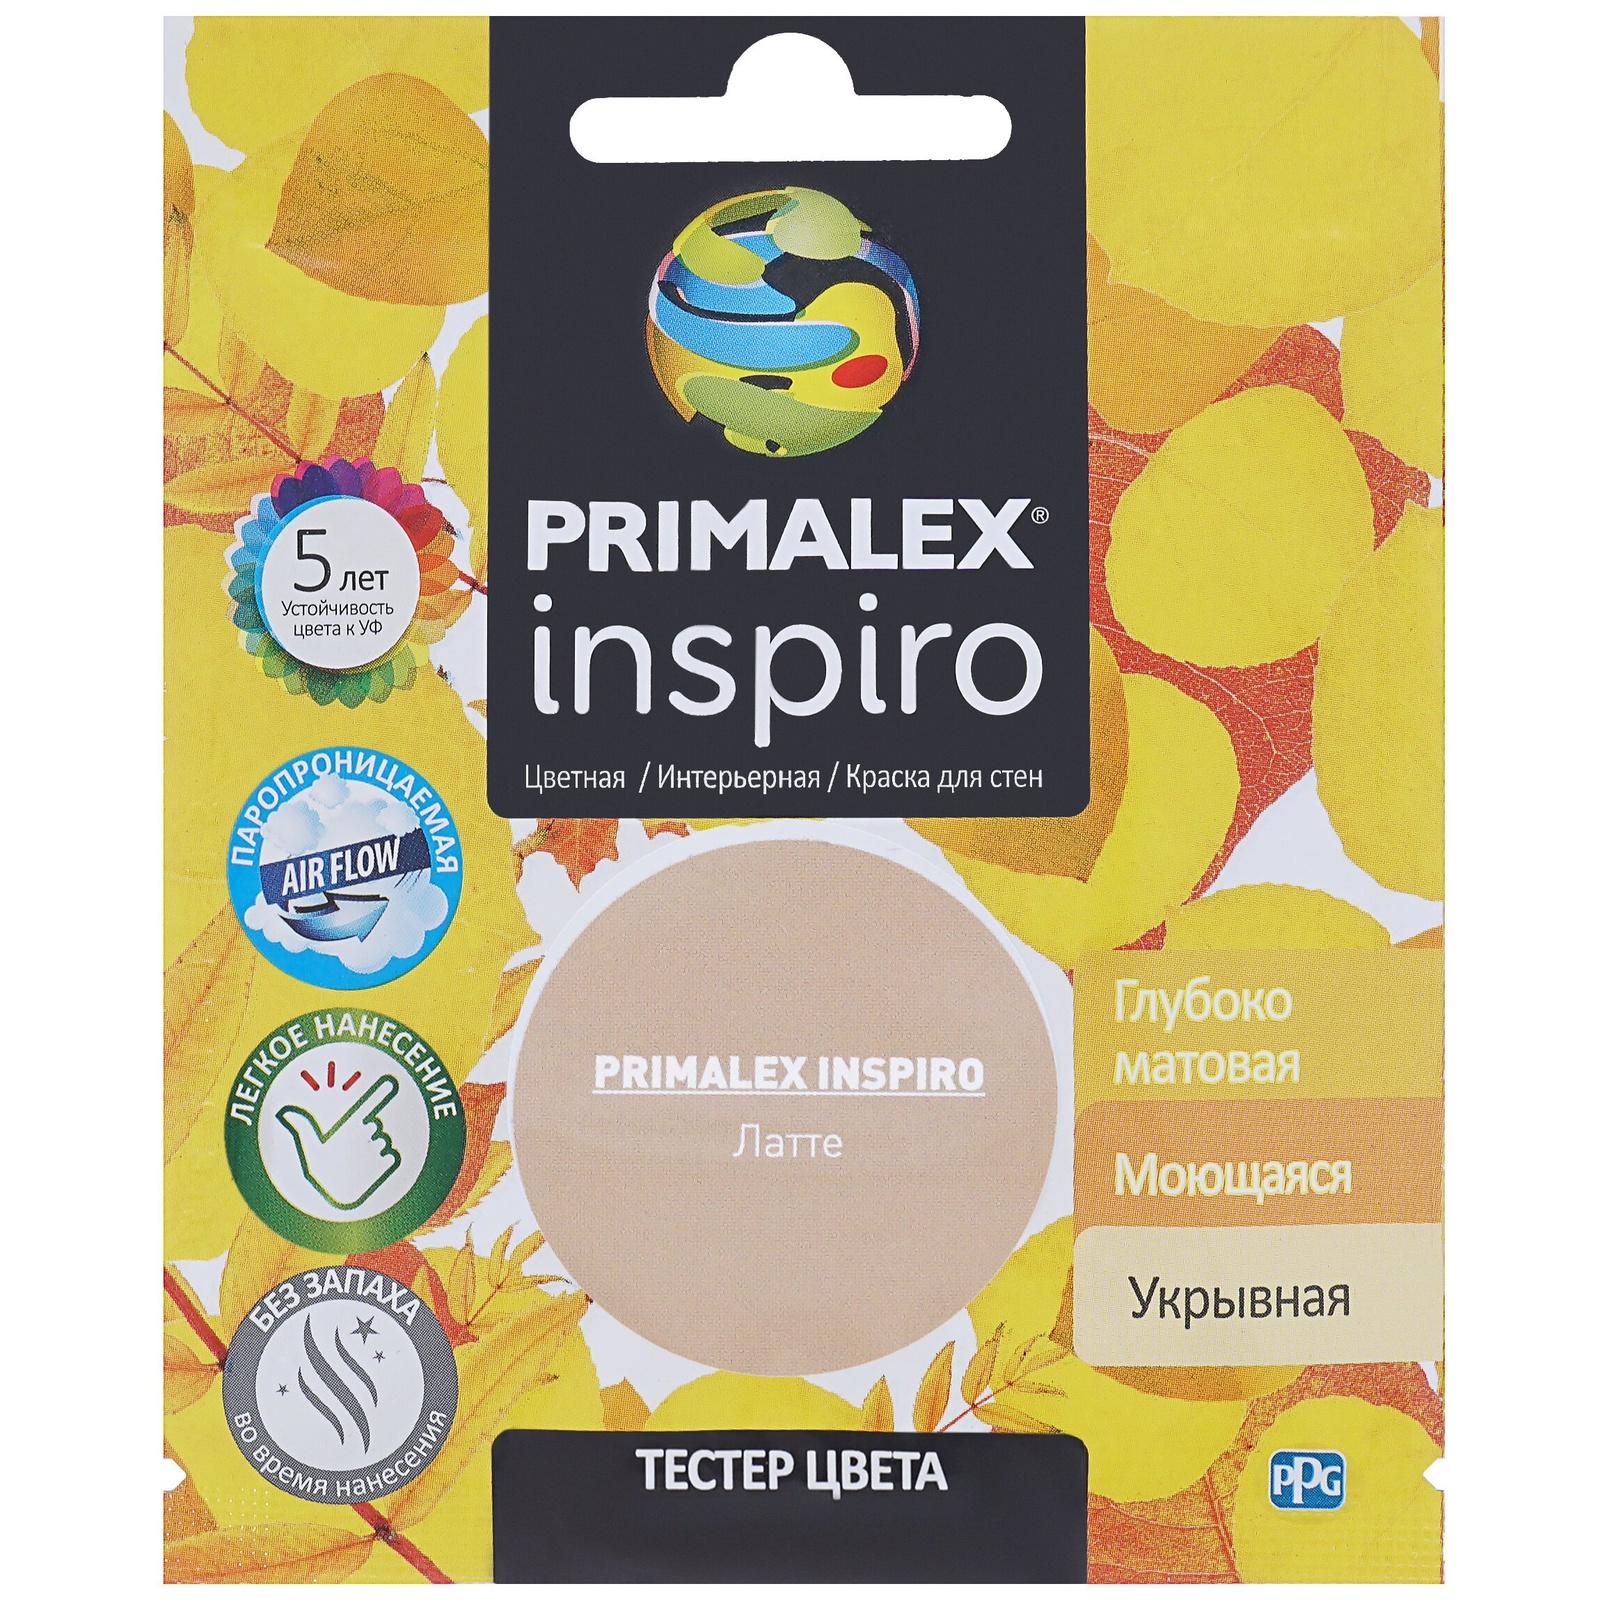 Краска PPG Primalex Inspiro Латте 40мл краска ppg primalex inspiro красный мак 40мл pmx i47